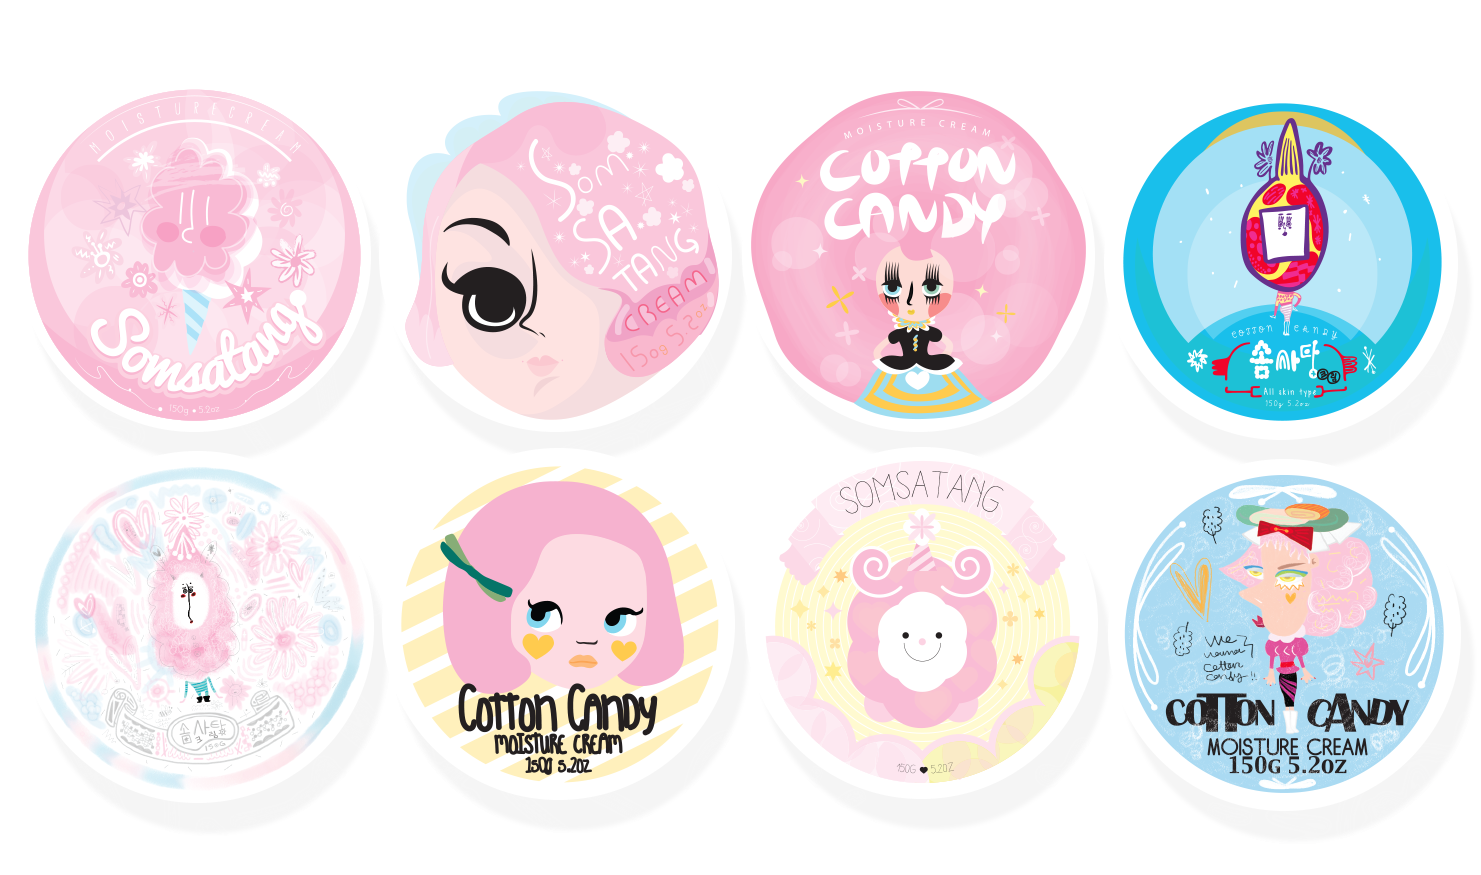 Cotton Candy Cream